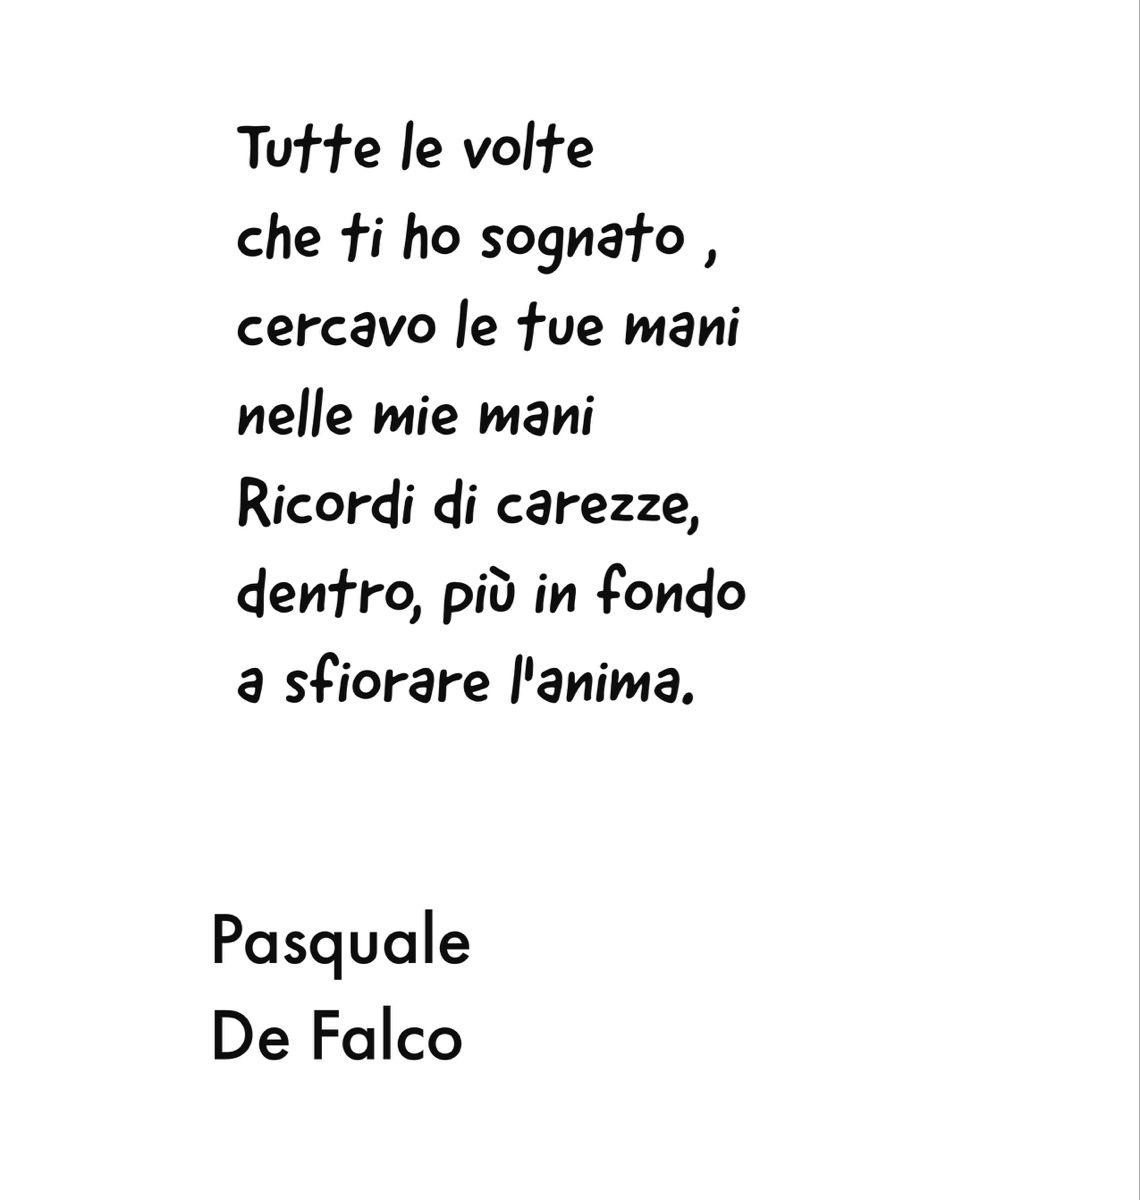 #frasi #poesiaitaliana #frasibelle